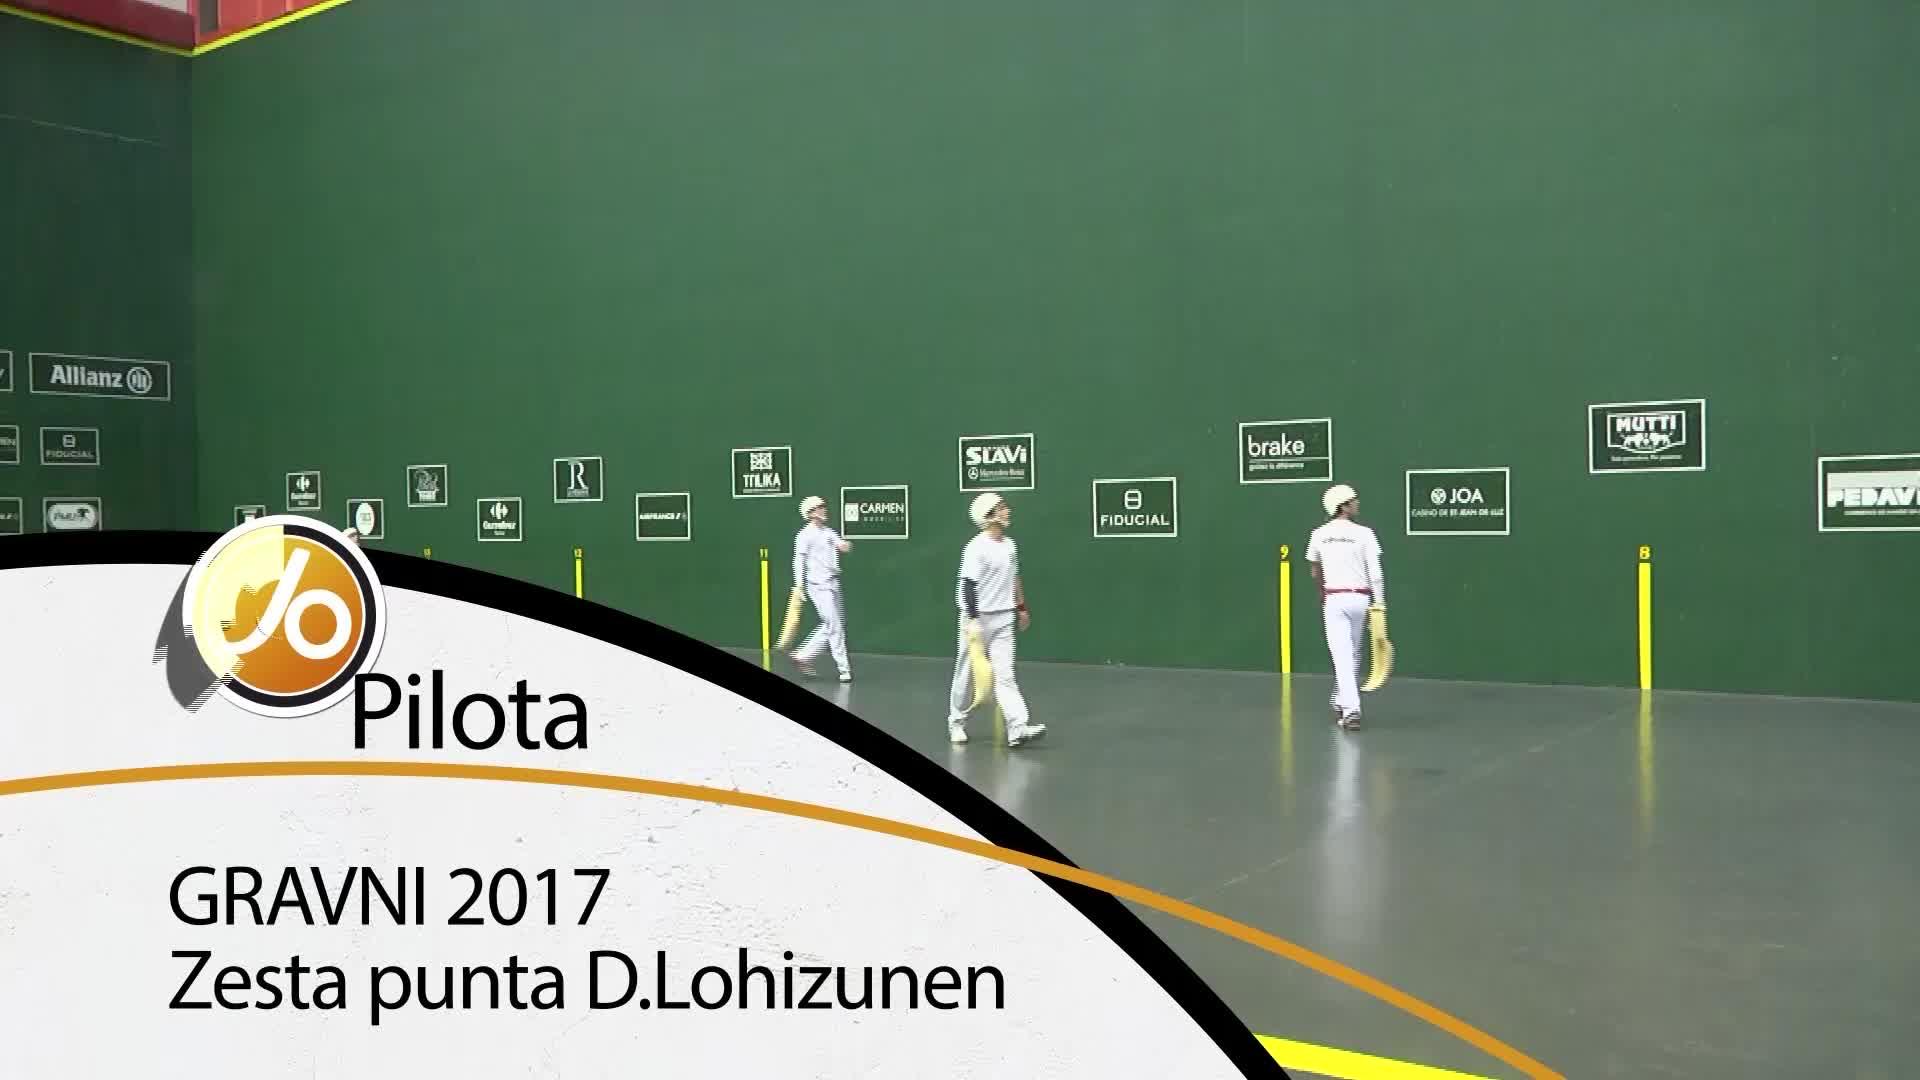 Gravni 2017: Zesta punta Donibane Lohizunen